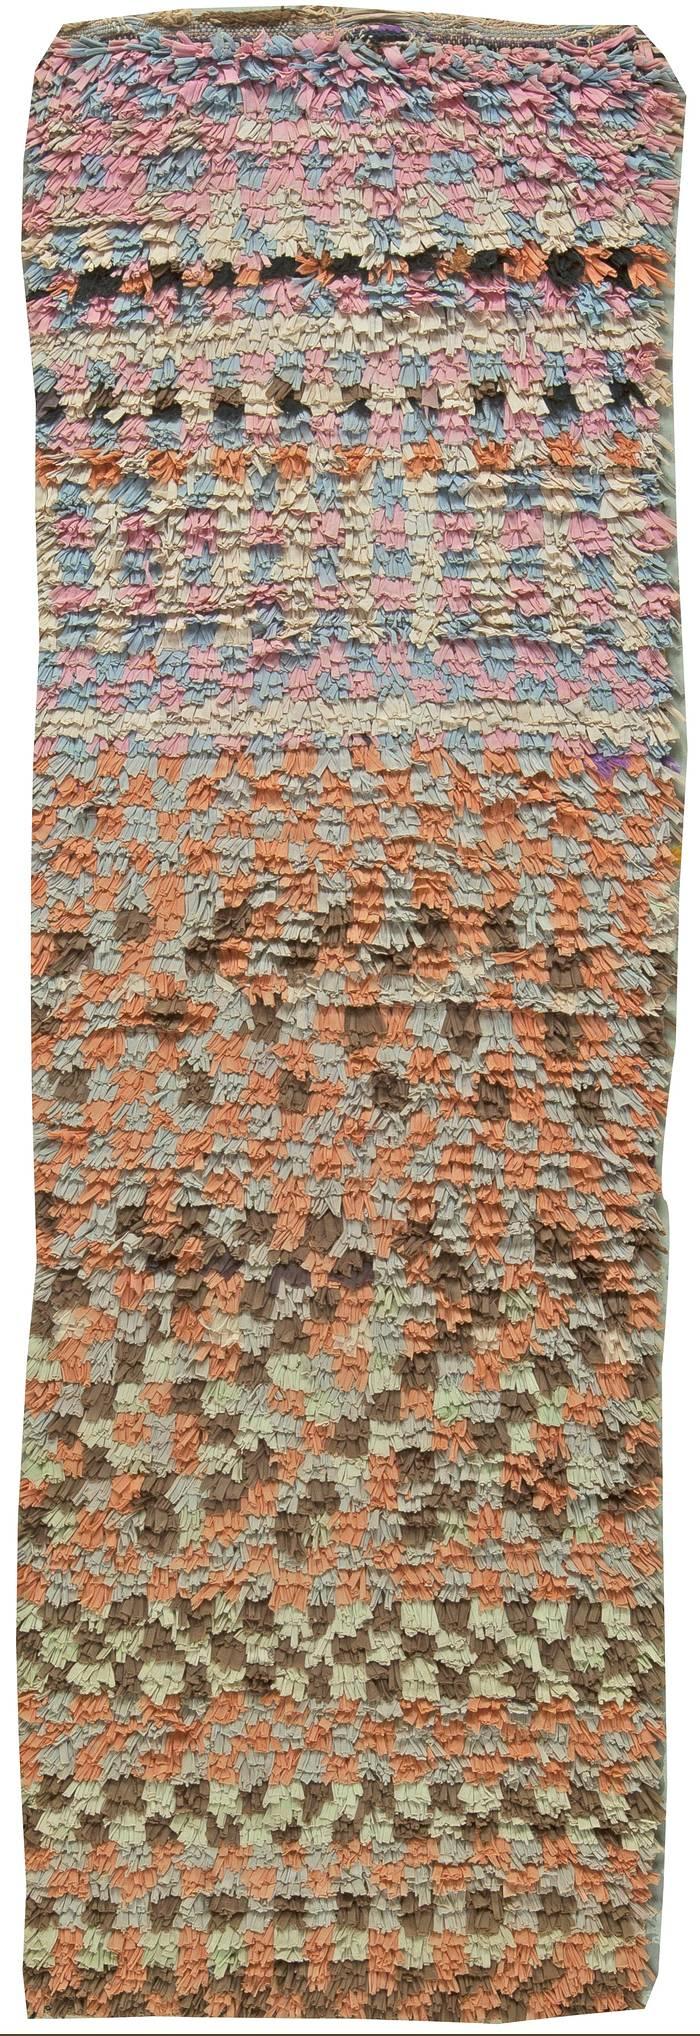 Moroccan Vintage Runner Rug BB5898